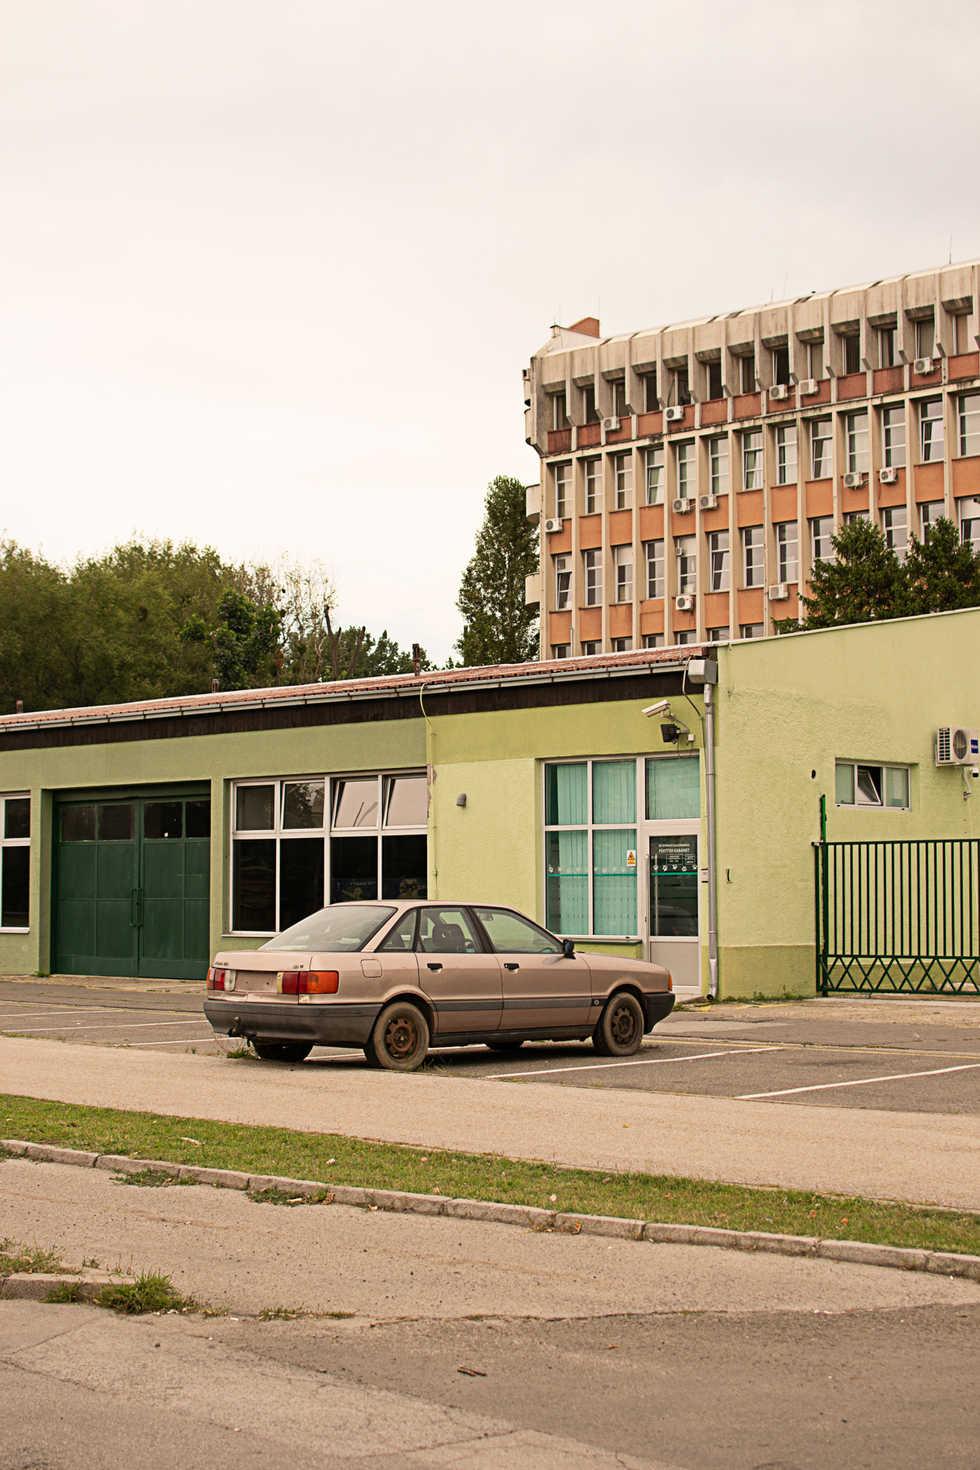 SERBIA '18